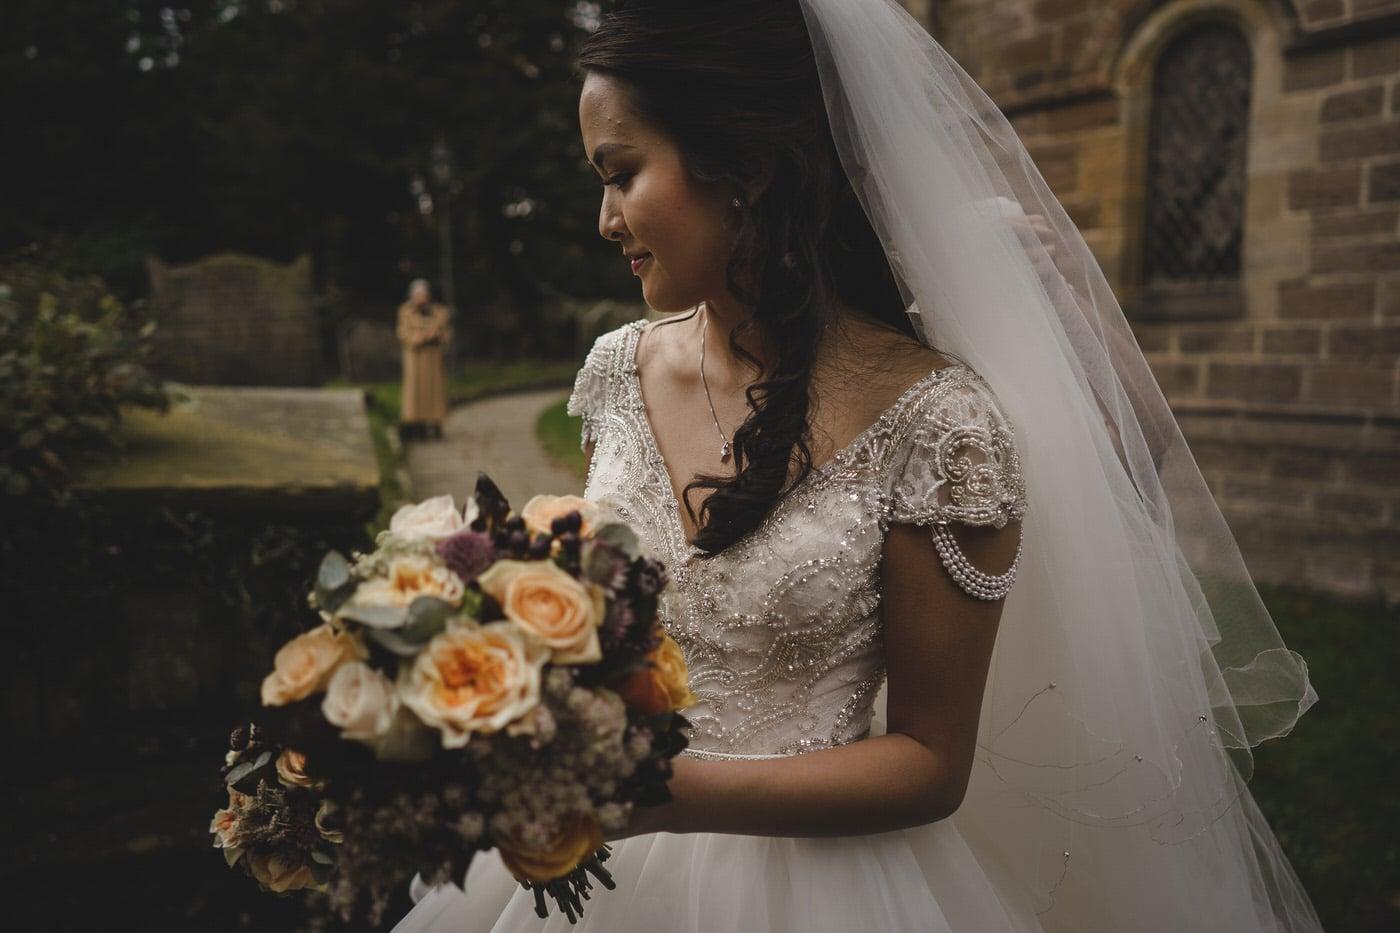 The beautiful Bride awaits at the Church